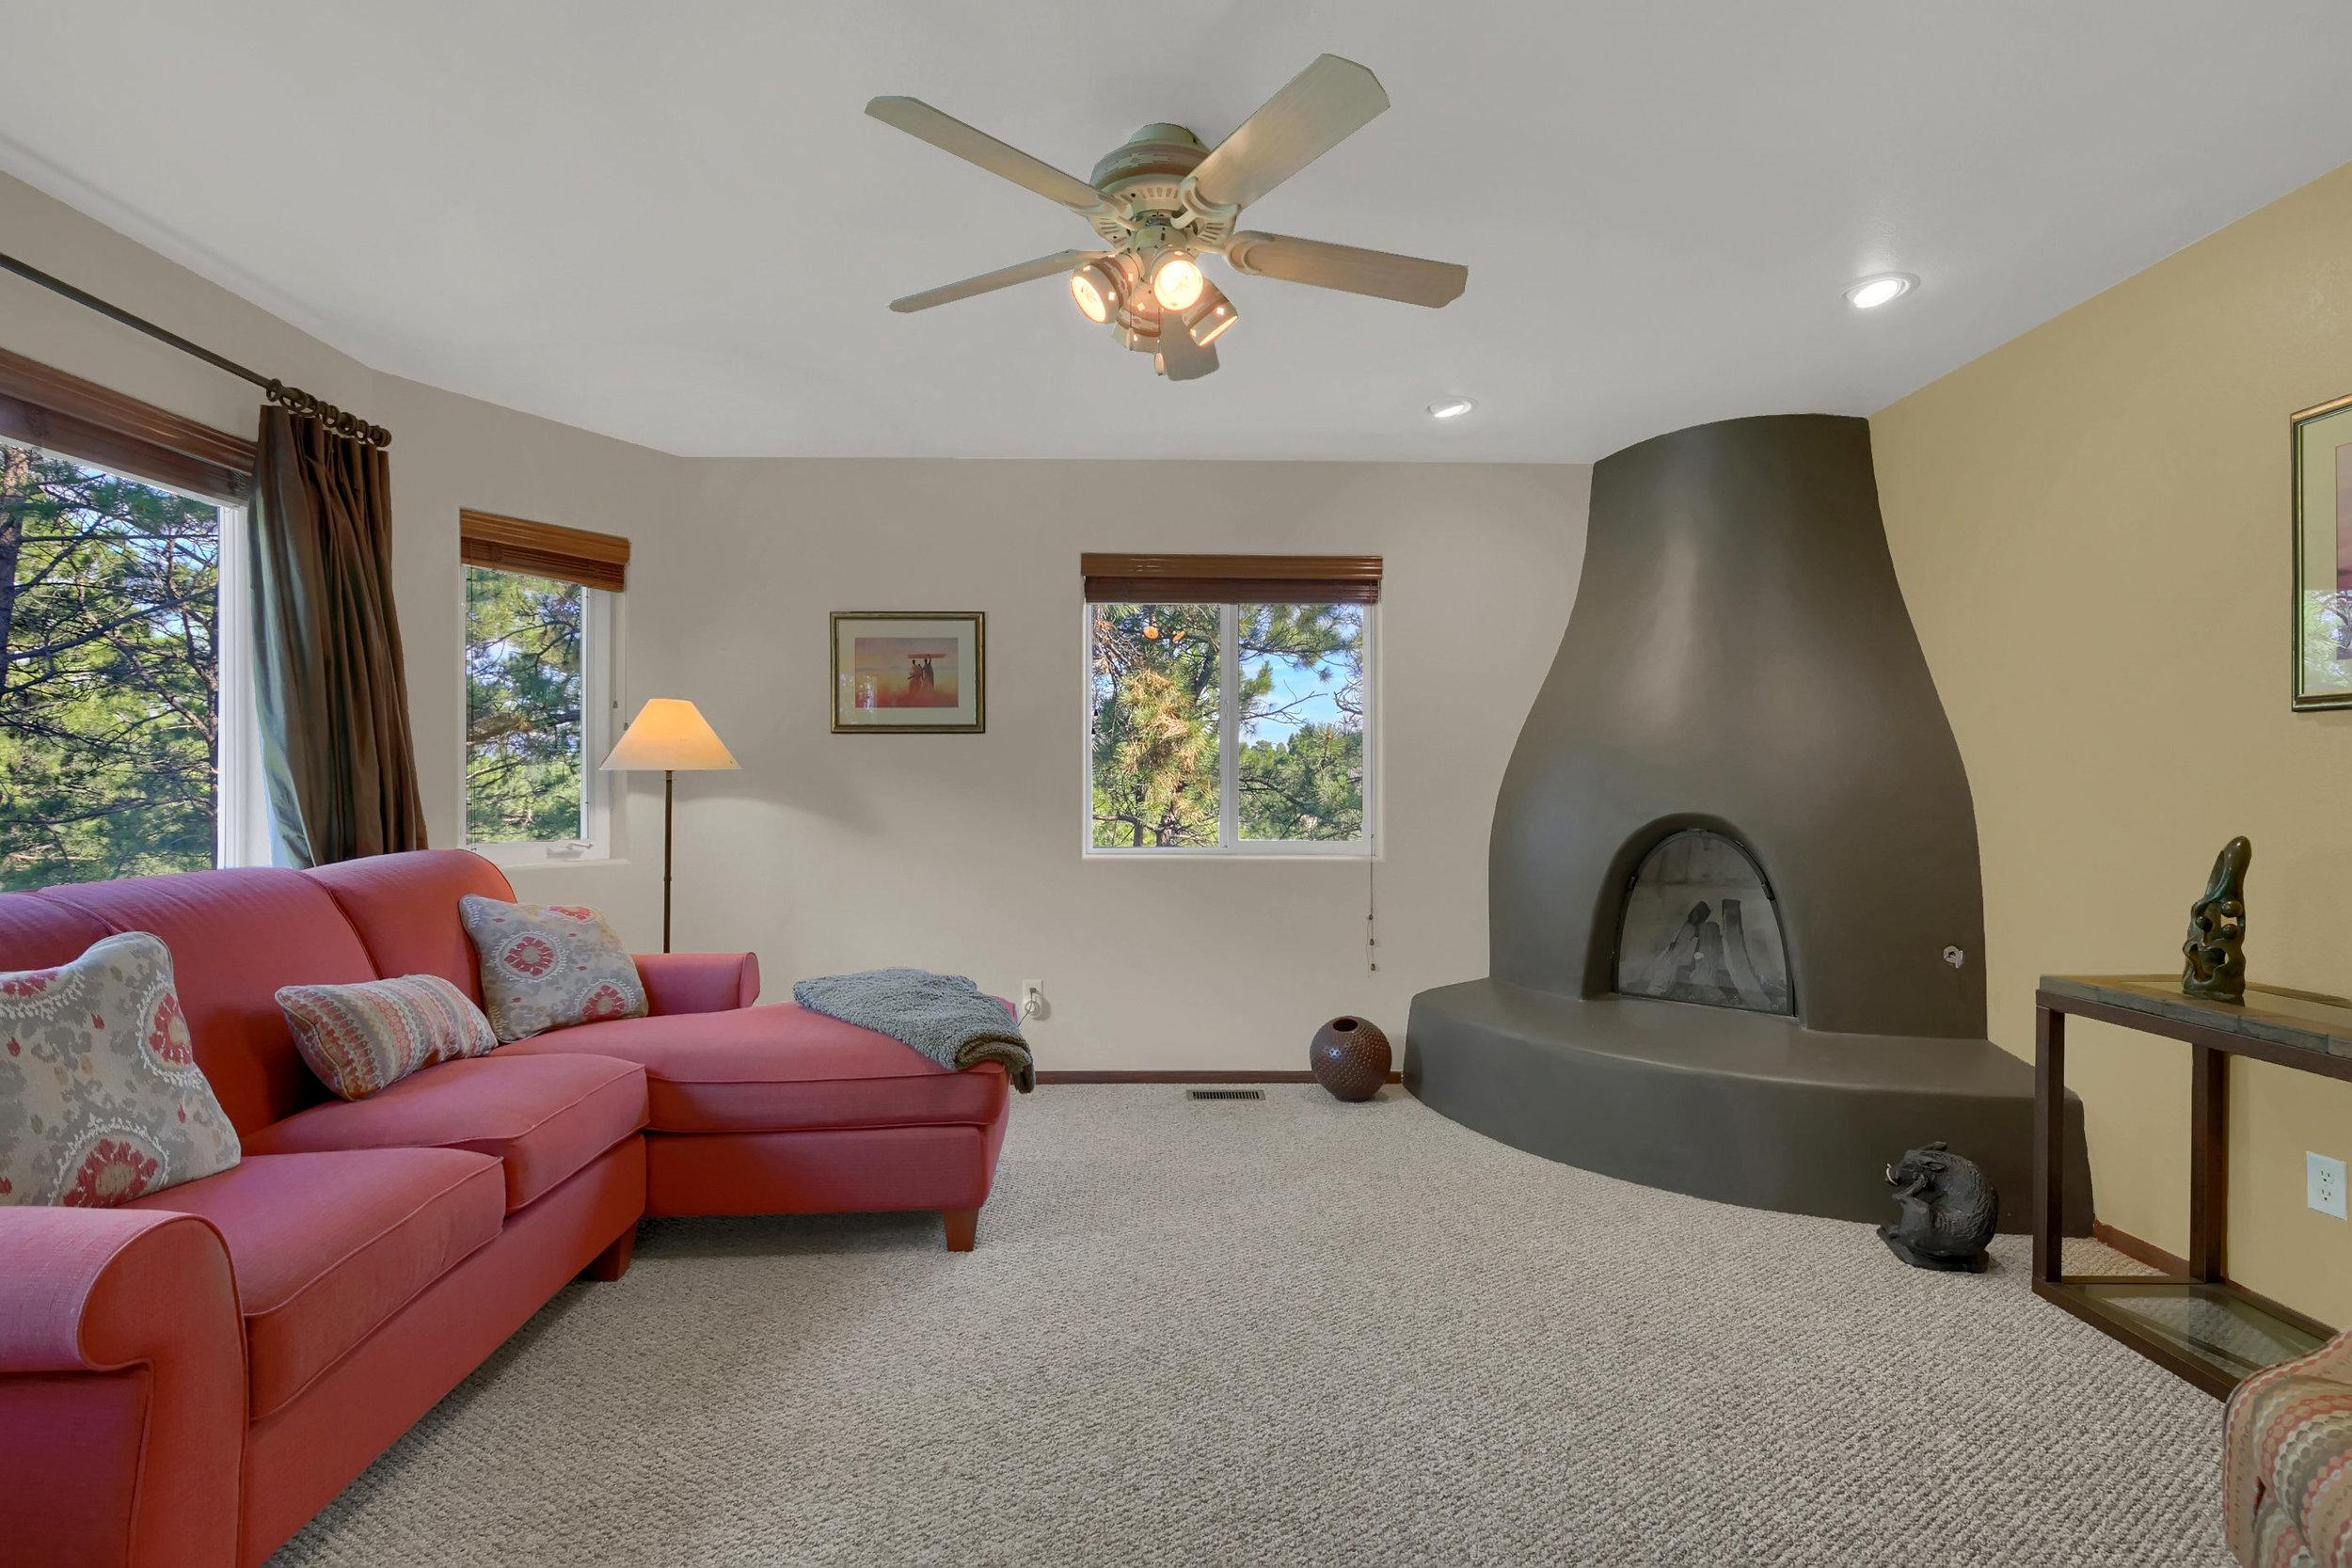 1605 Vickers Drive Colorado-print-010-002-Family Room-2800x1867-300dpi.jpg